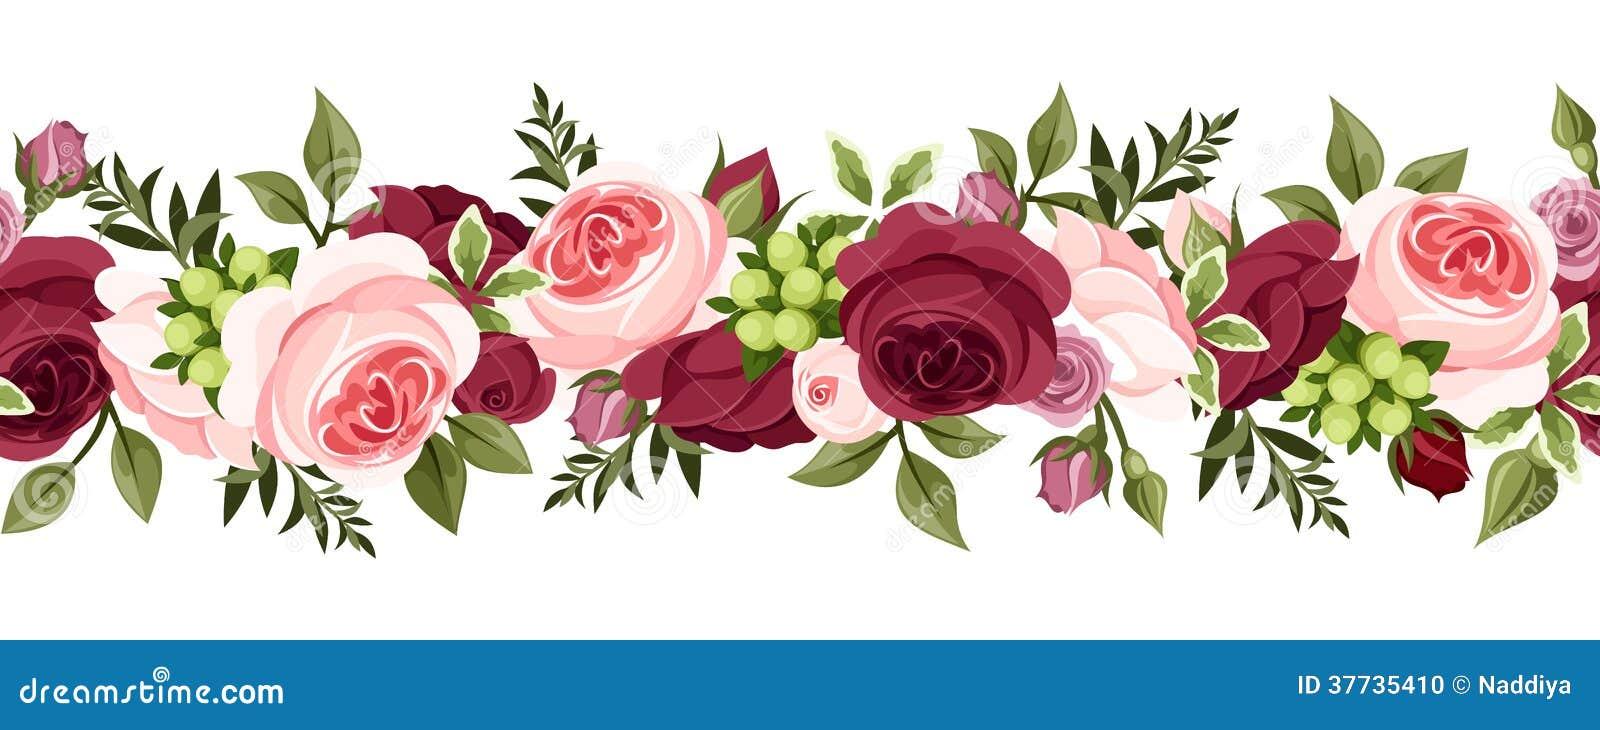 Flores Horizontales Dibujos Animados Patrón De Fondo: Horizontal Seamless Background With Roses. Stock Vector